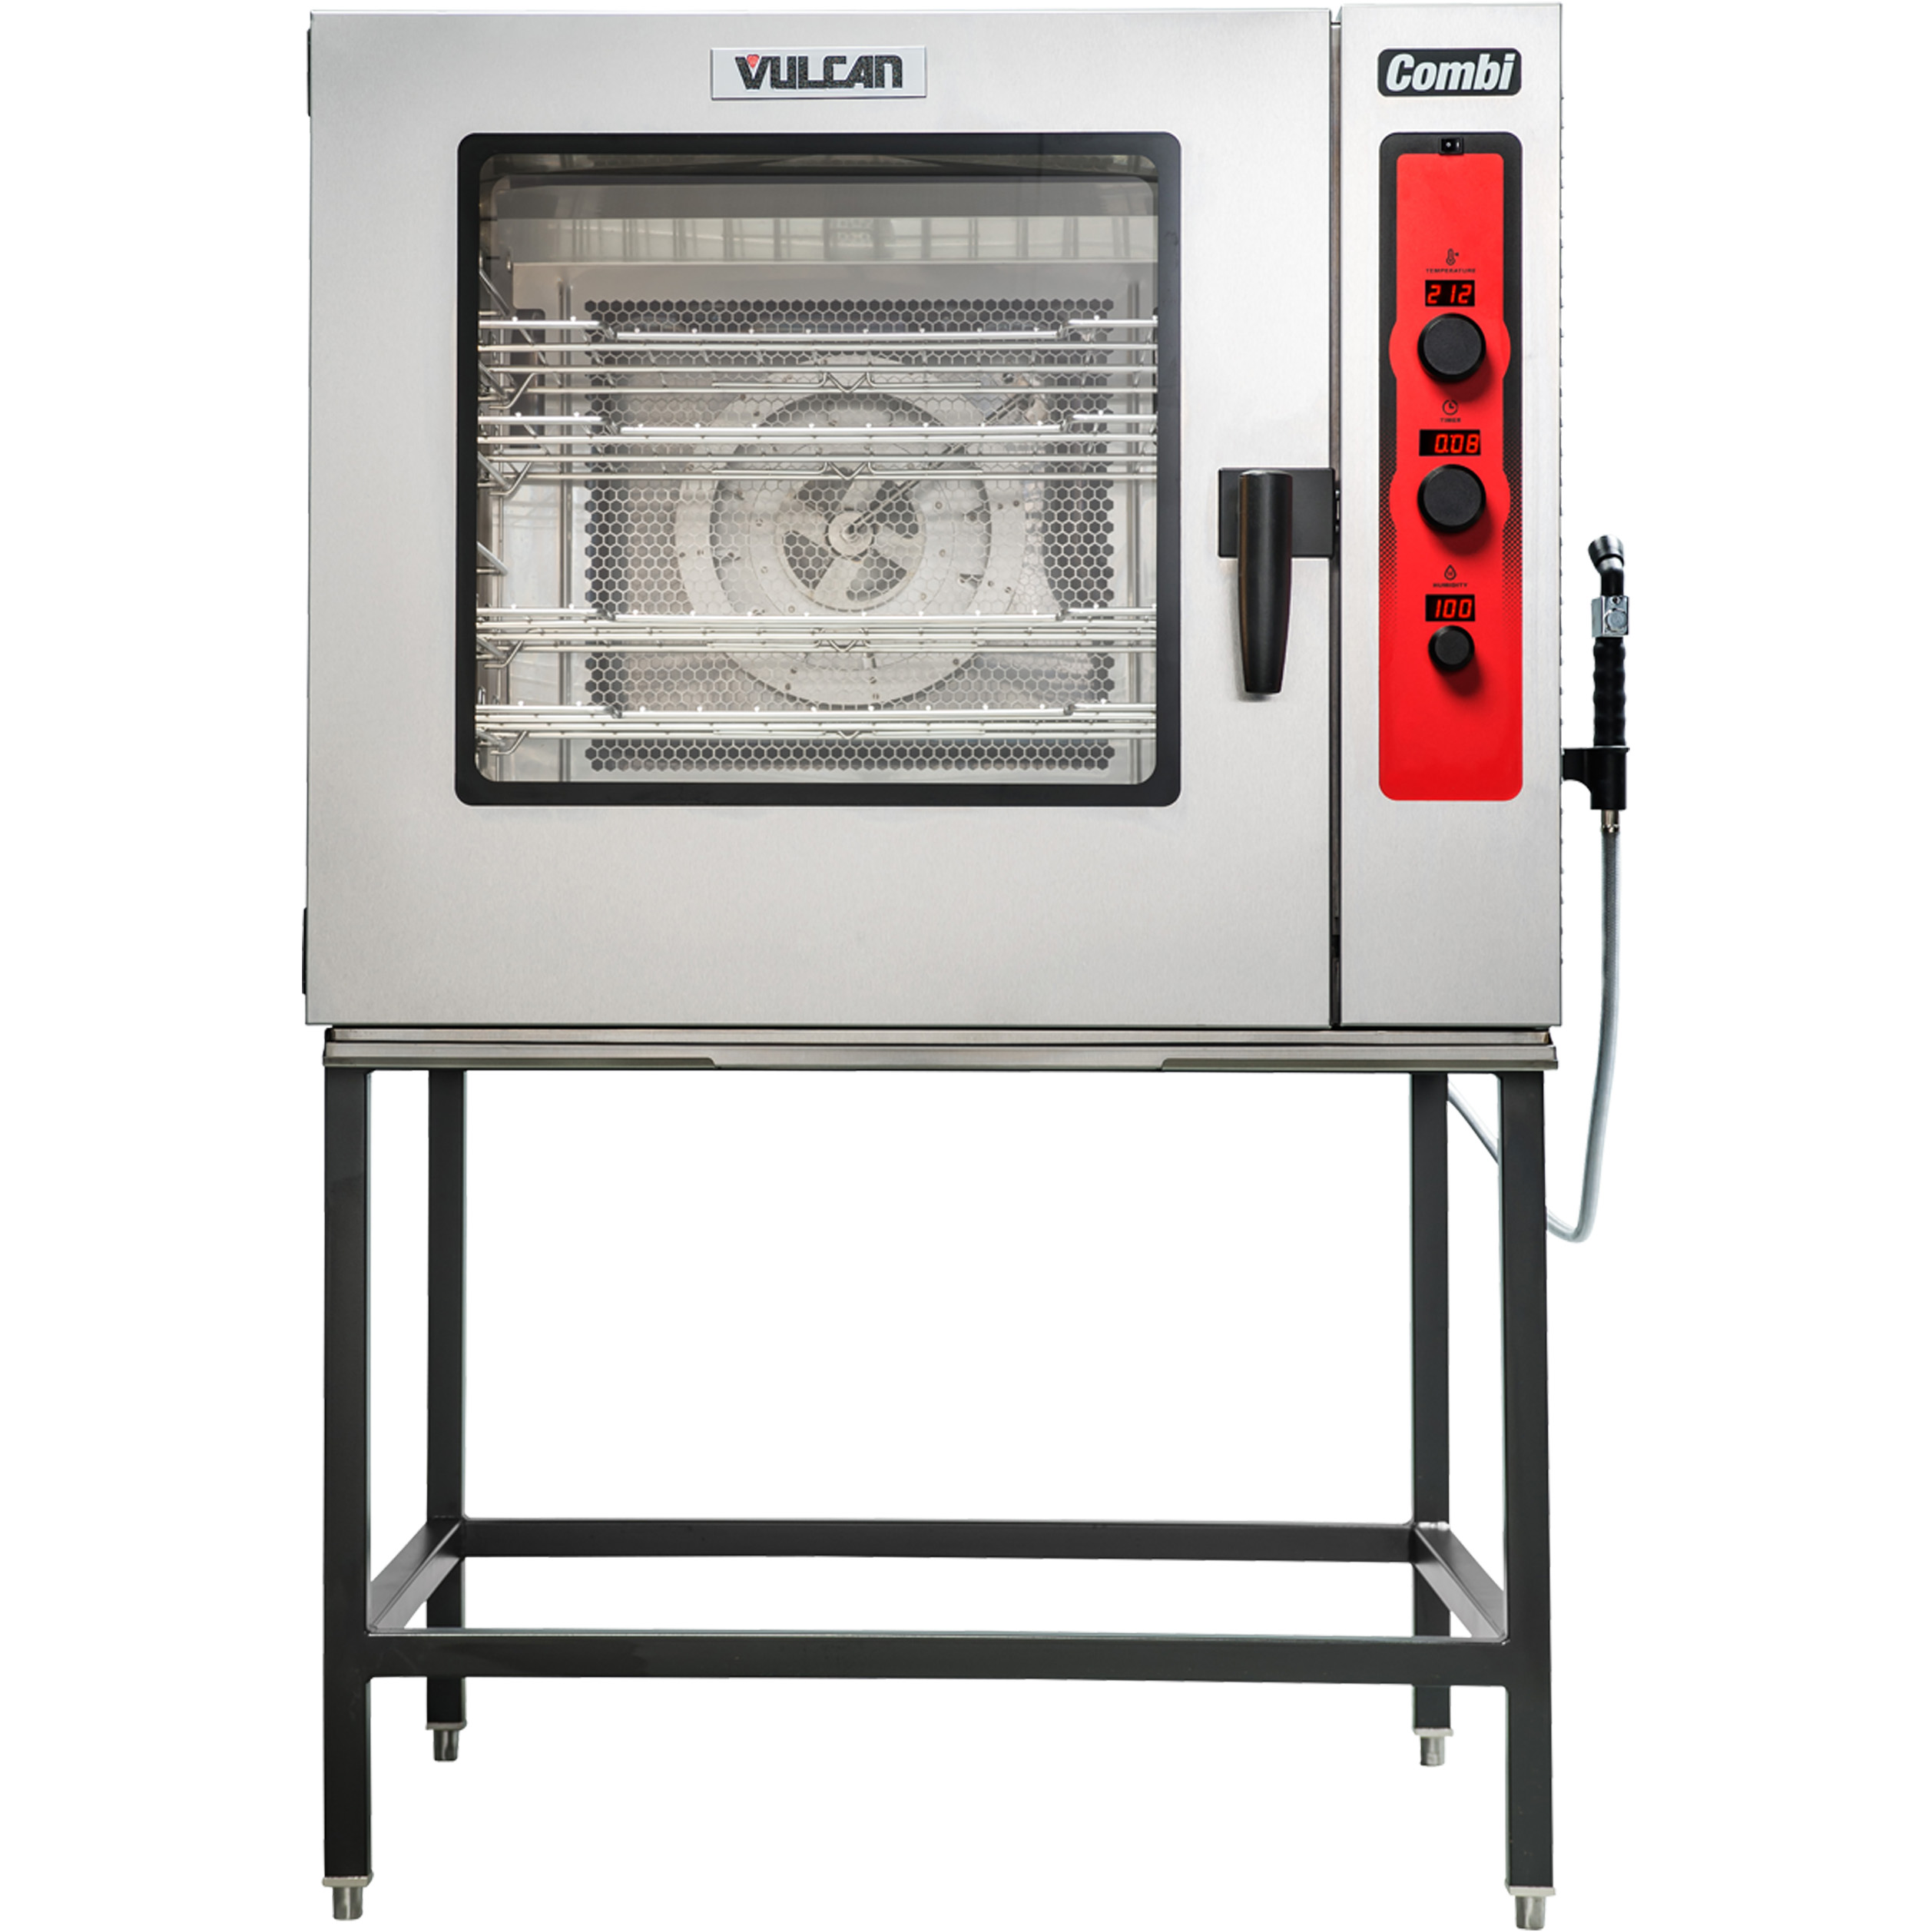 Vulcan ABC7E-208P combi oven, electric